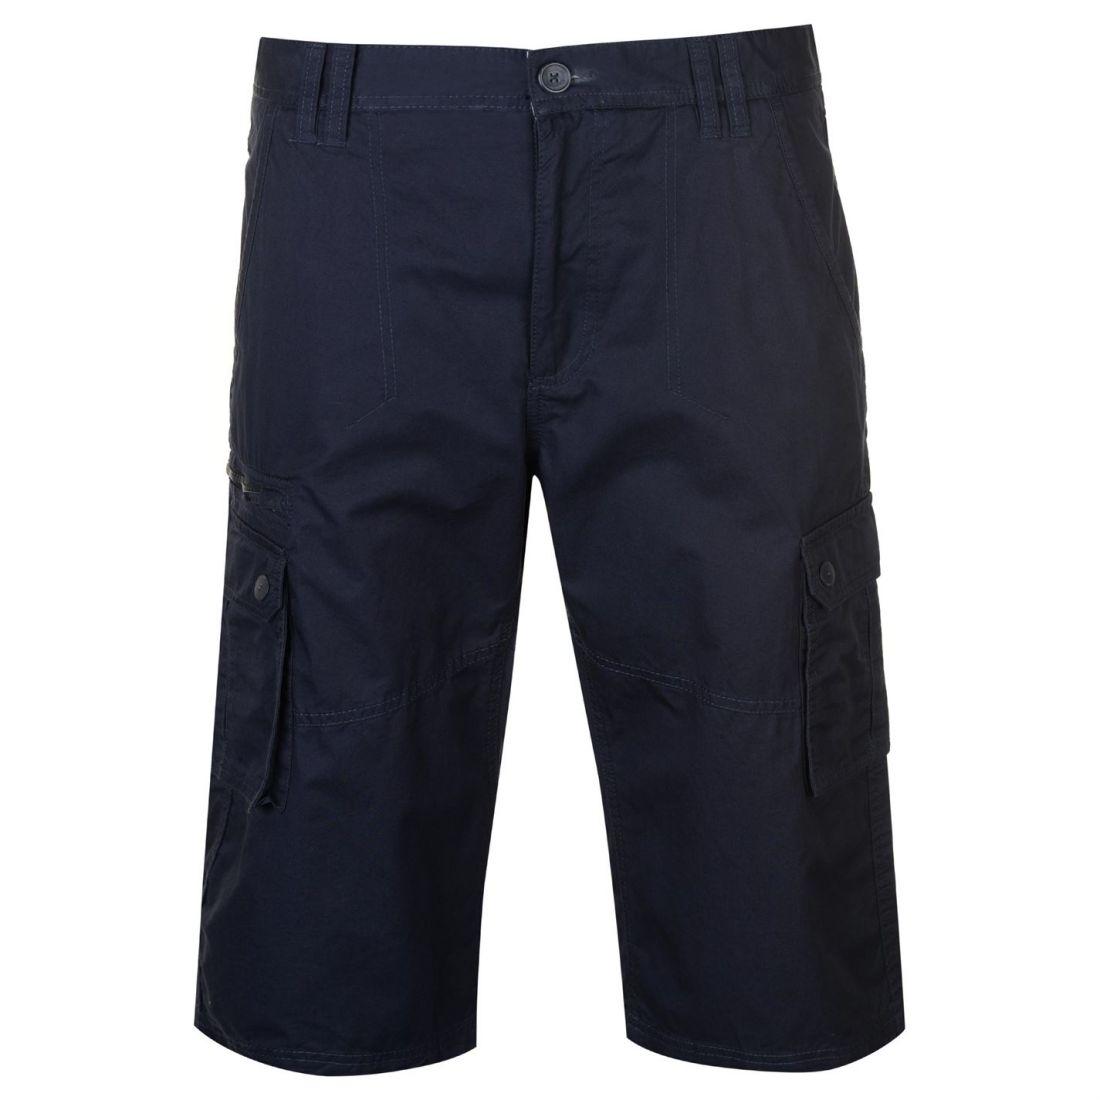 a57c21154024a Pierre Cardin C three quarter Wvn Sht Mens Gents Woven Shorts Pants ...